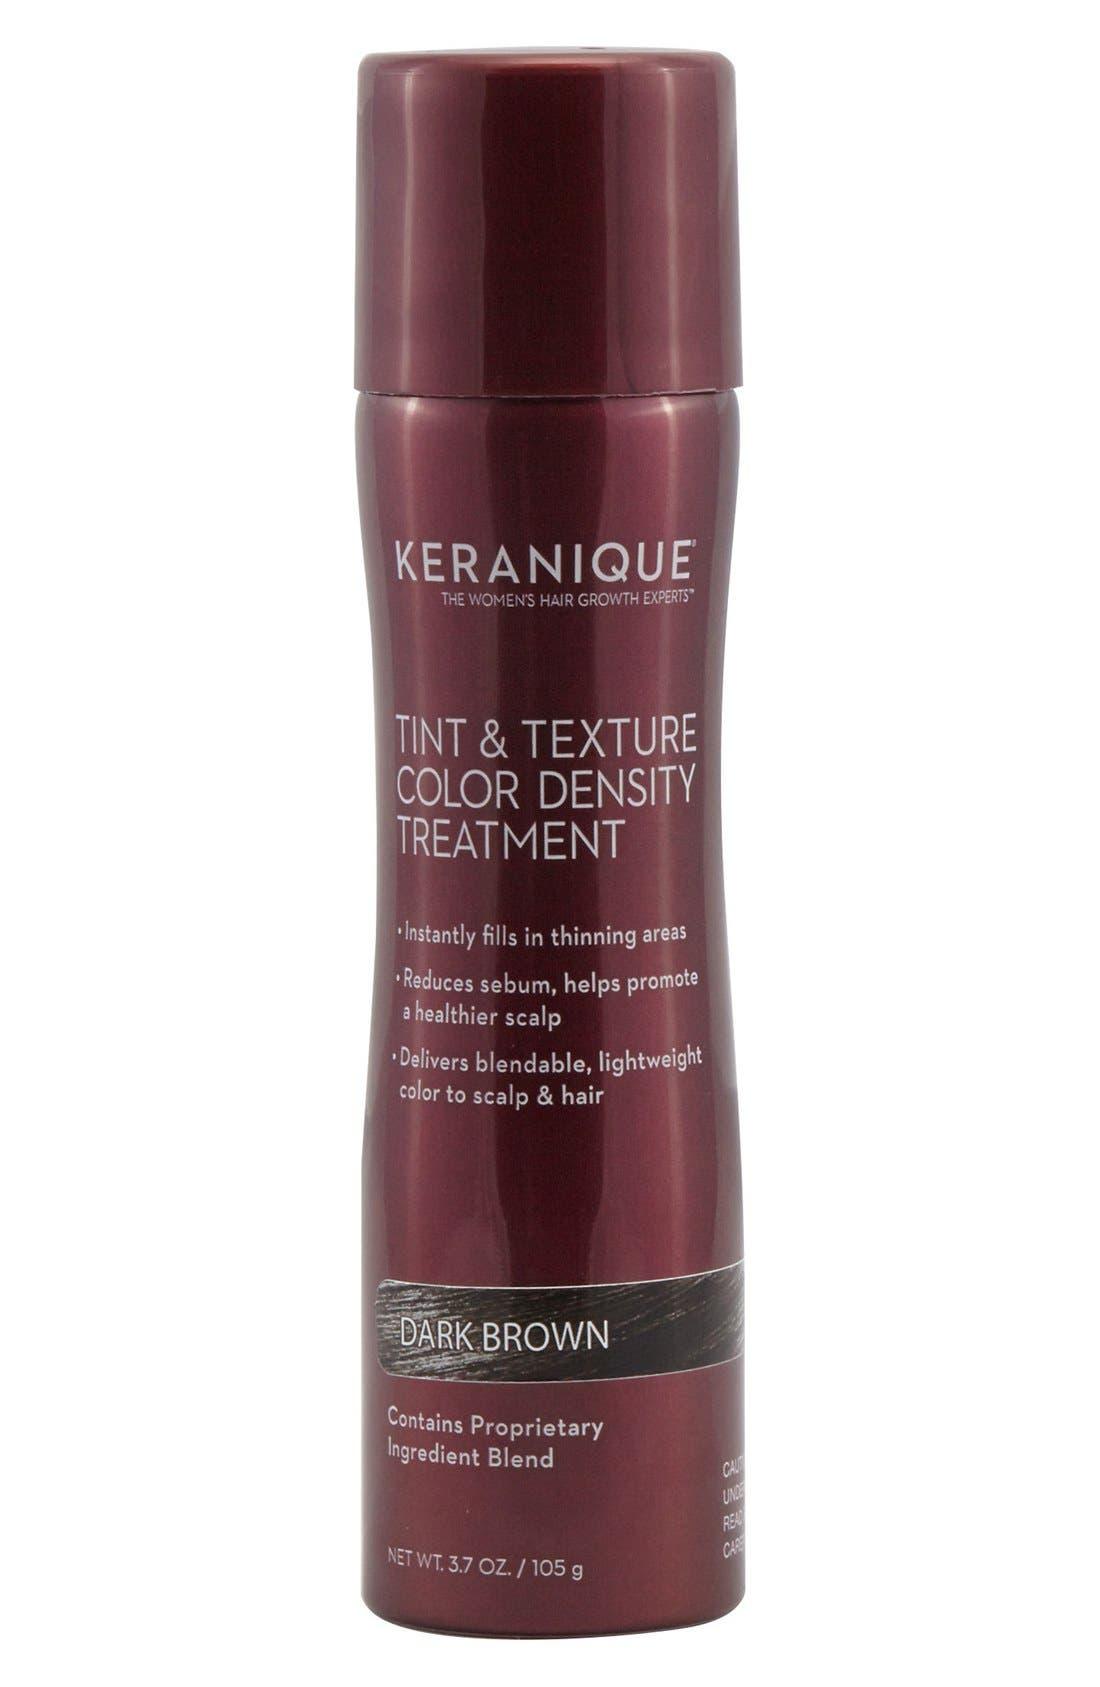 Keranique Tint & Texture Color Density Treatment